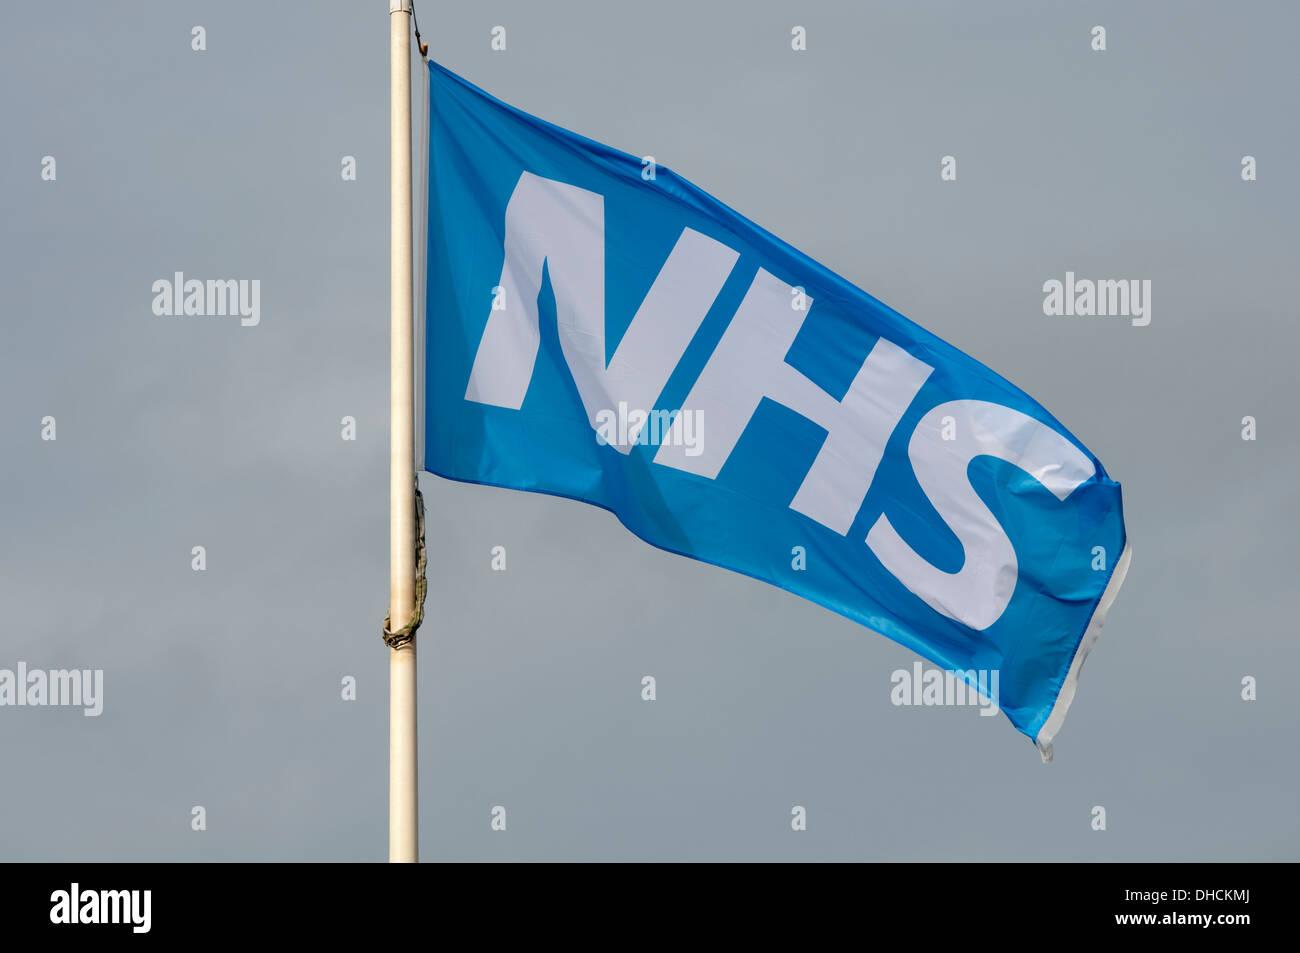 NHS flag - Stock Image